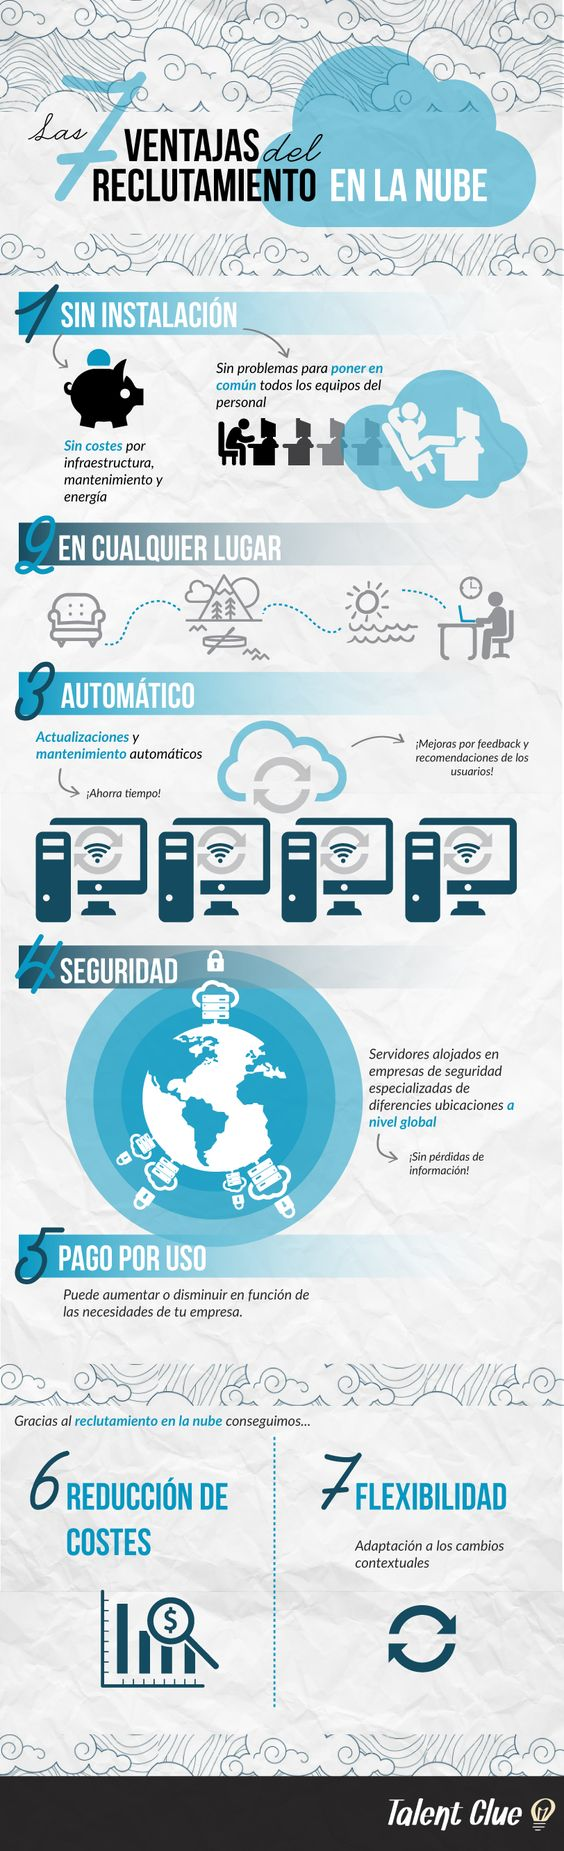 #Infografia #Curiosidades Reclutamiento en la Nube. #TAVnews: